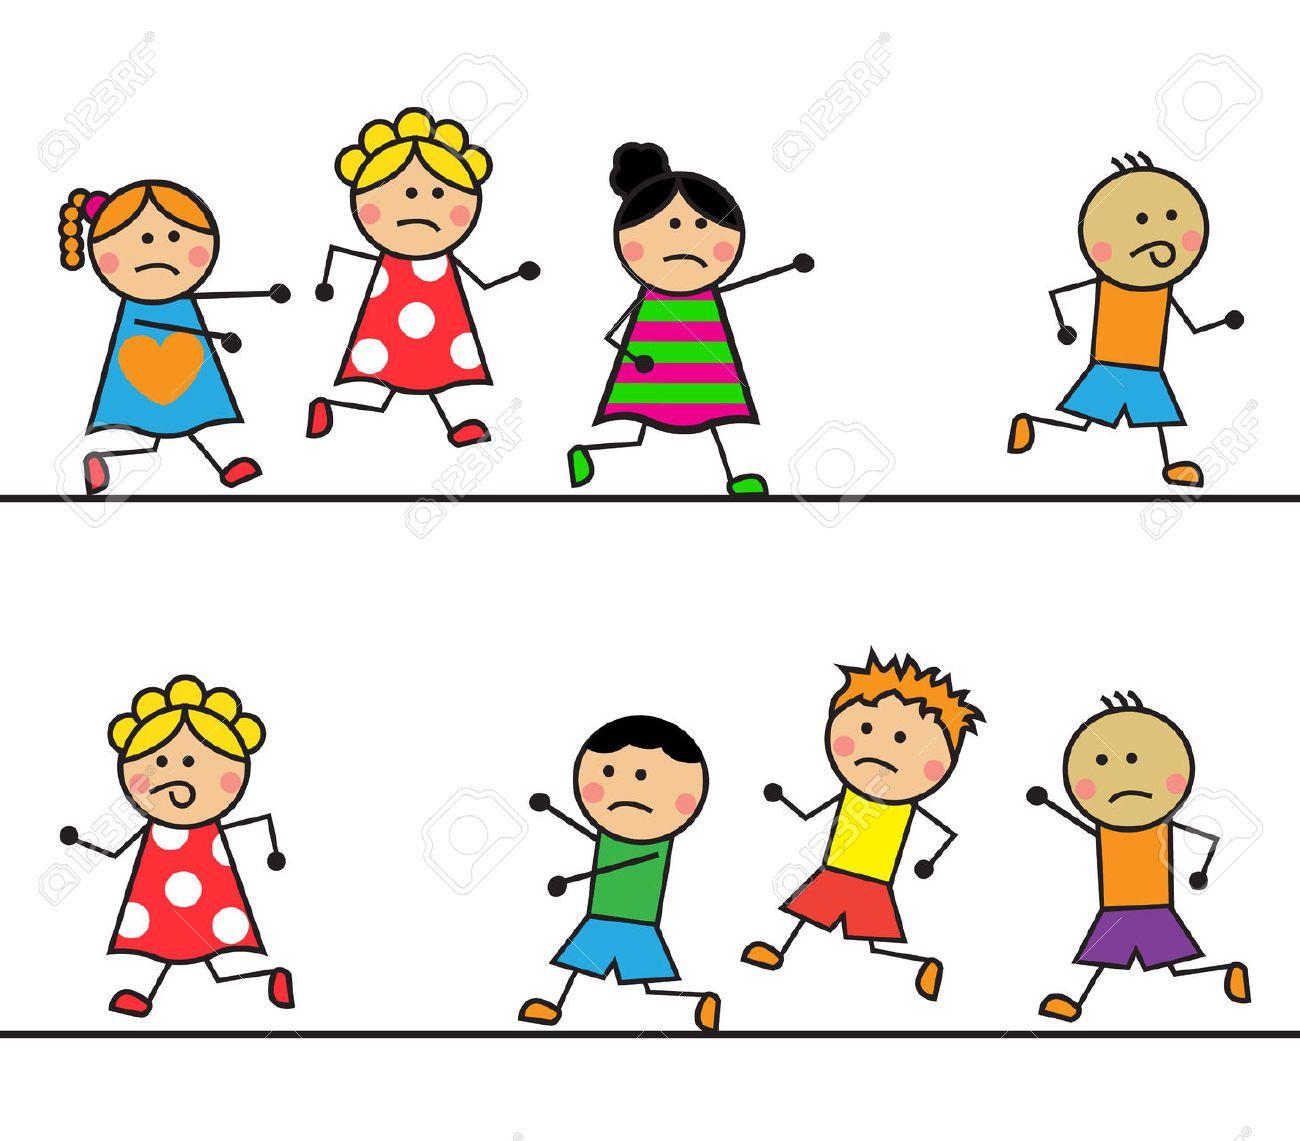 niños corriendo dibujo animado - Buscar con Google   fondos ...